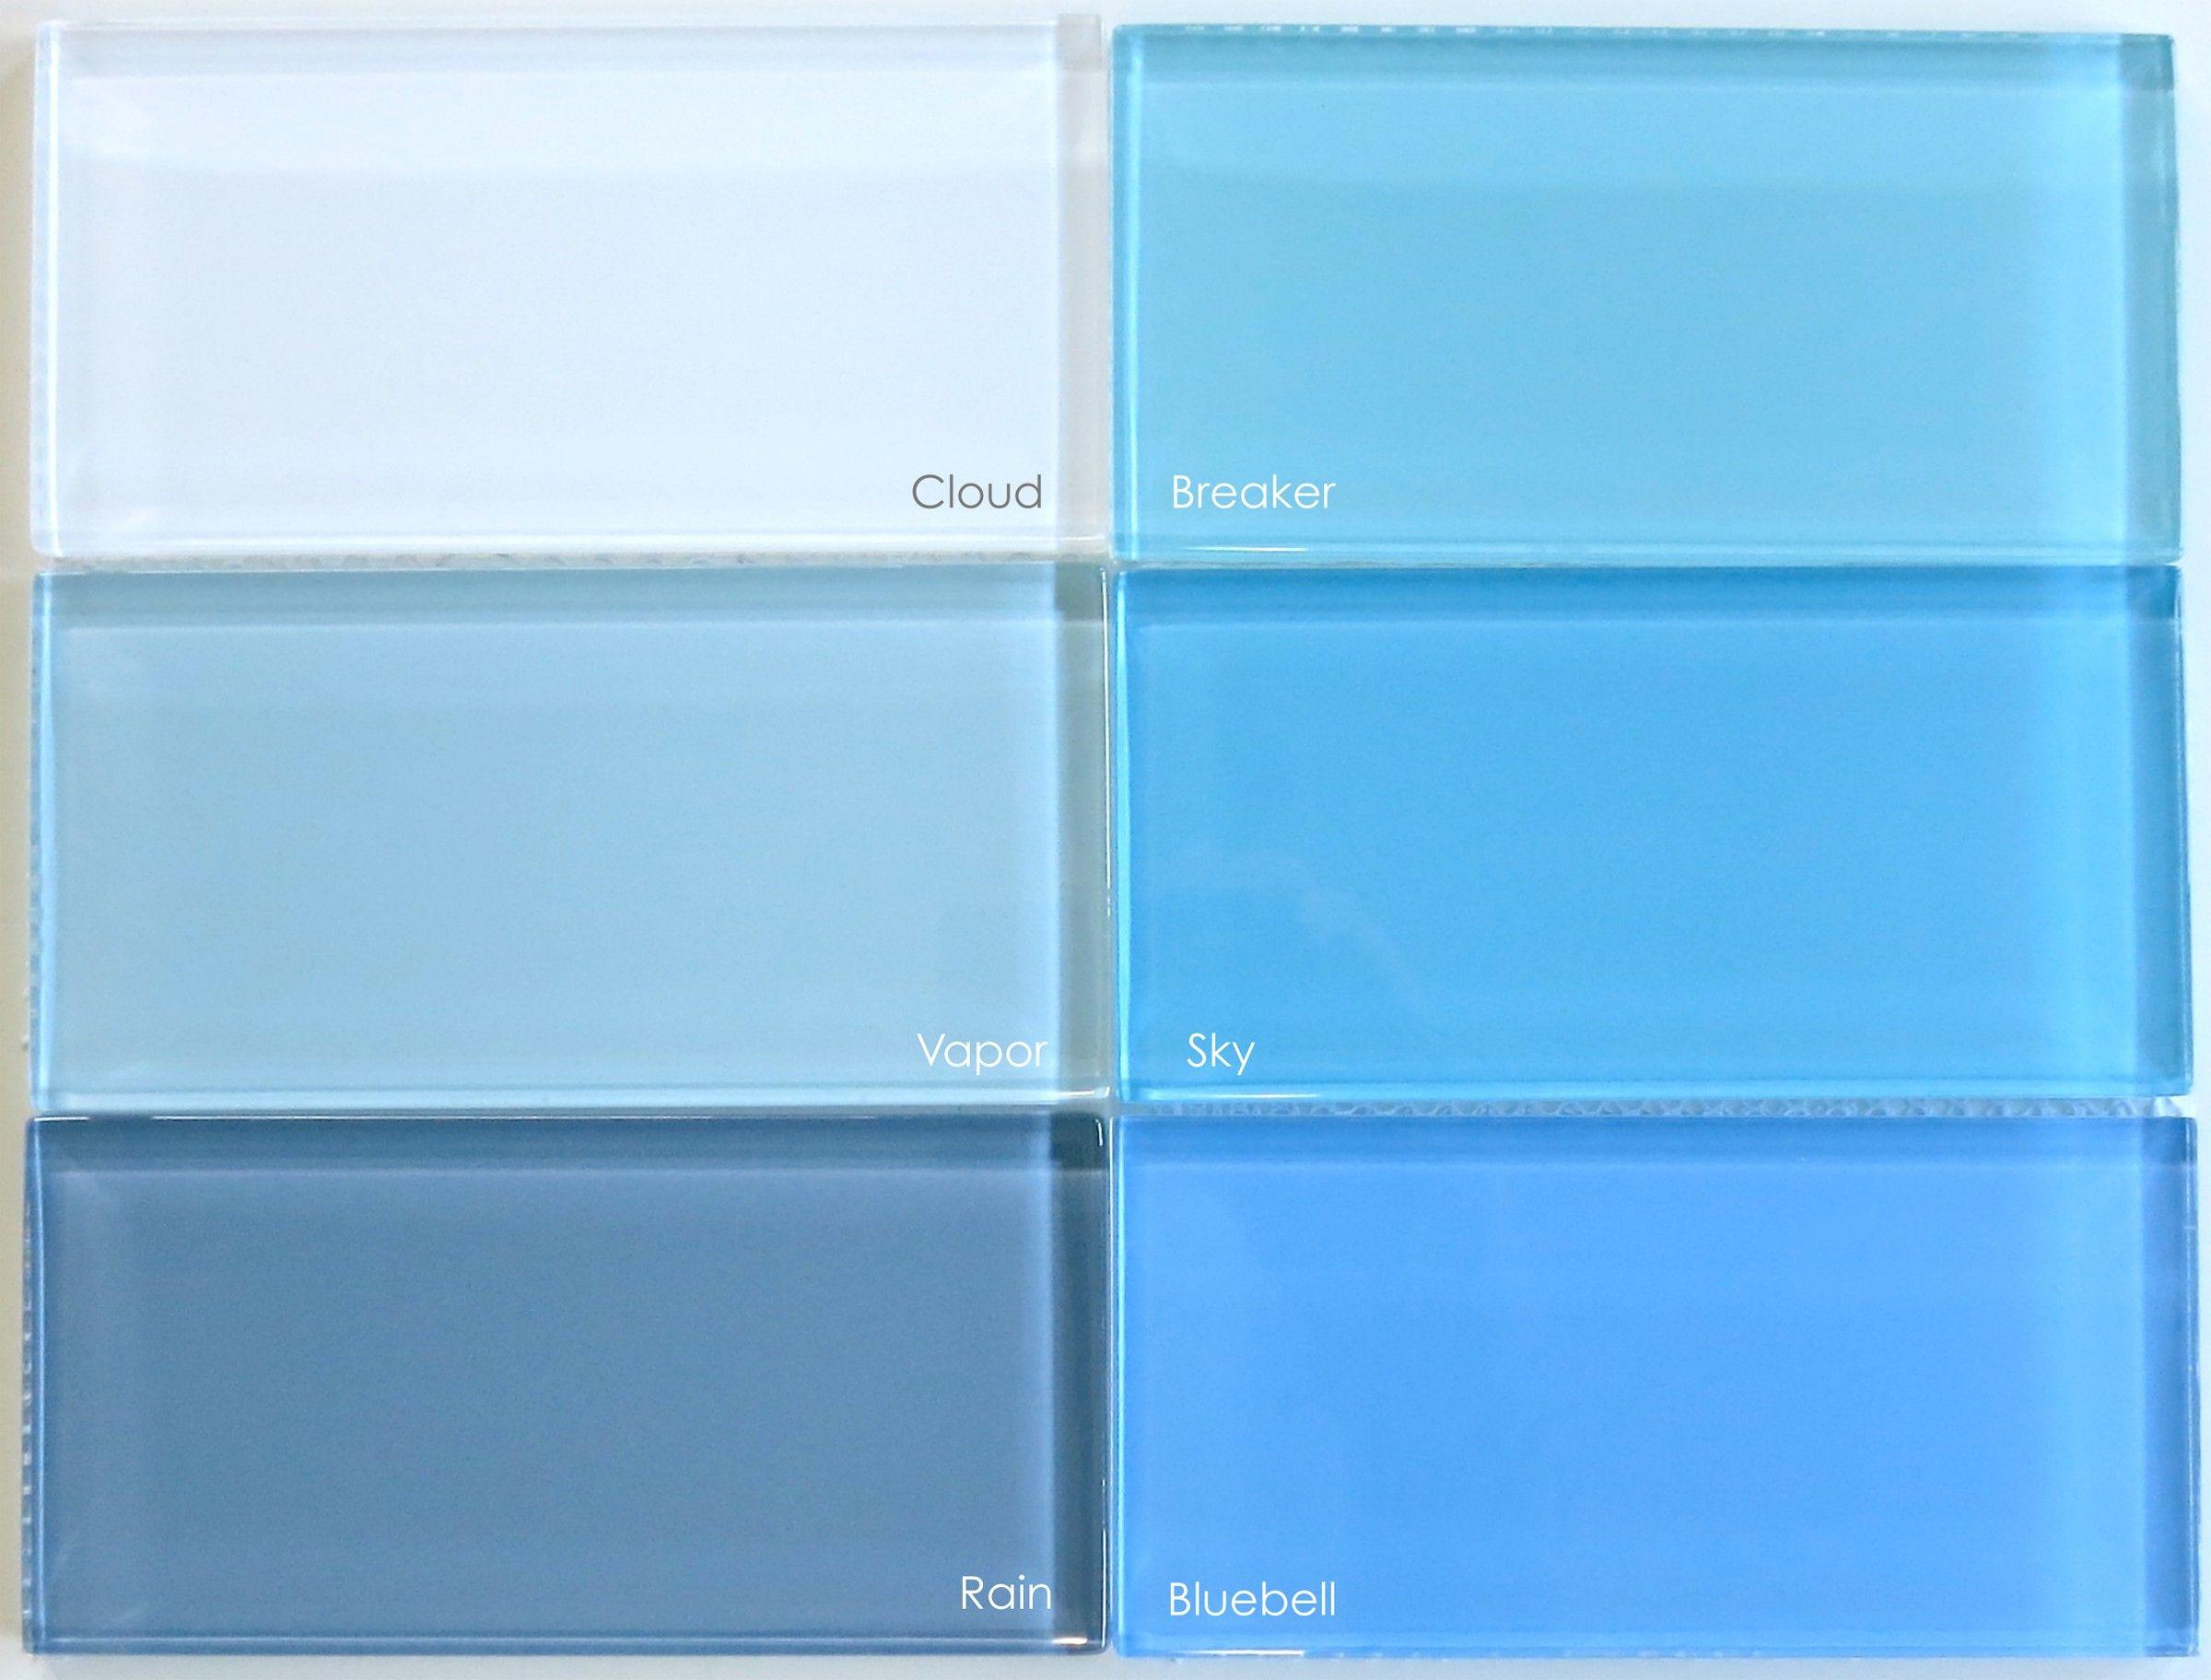 Lush 3x6 periwinkle blue glass subway tile subway tiles lush lush 3x6 periwinkle blue glass subway tile doublecrazyfo Gallery